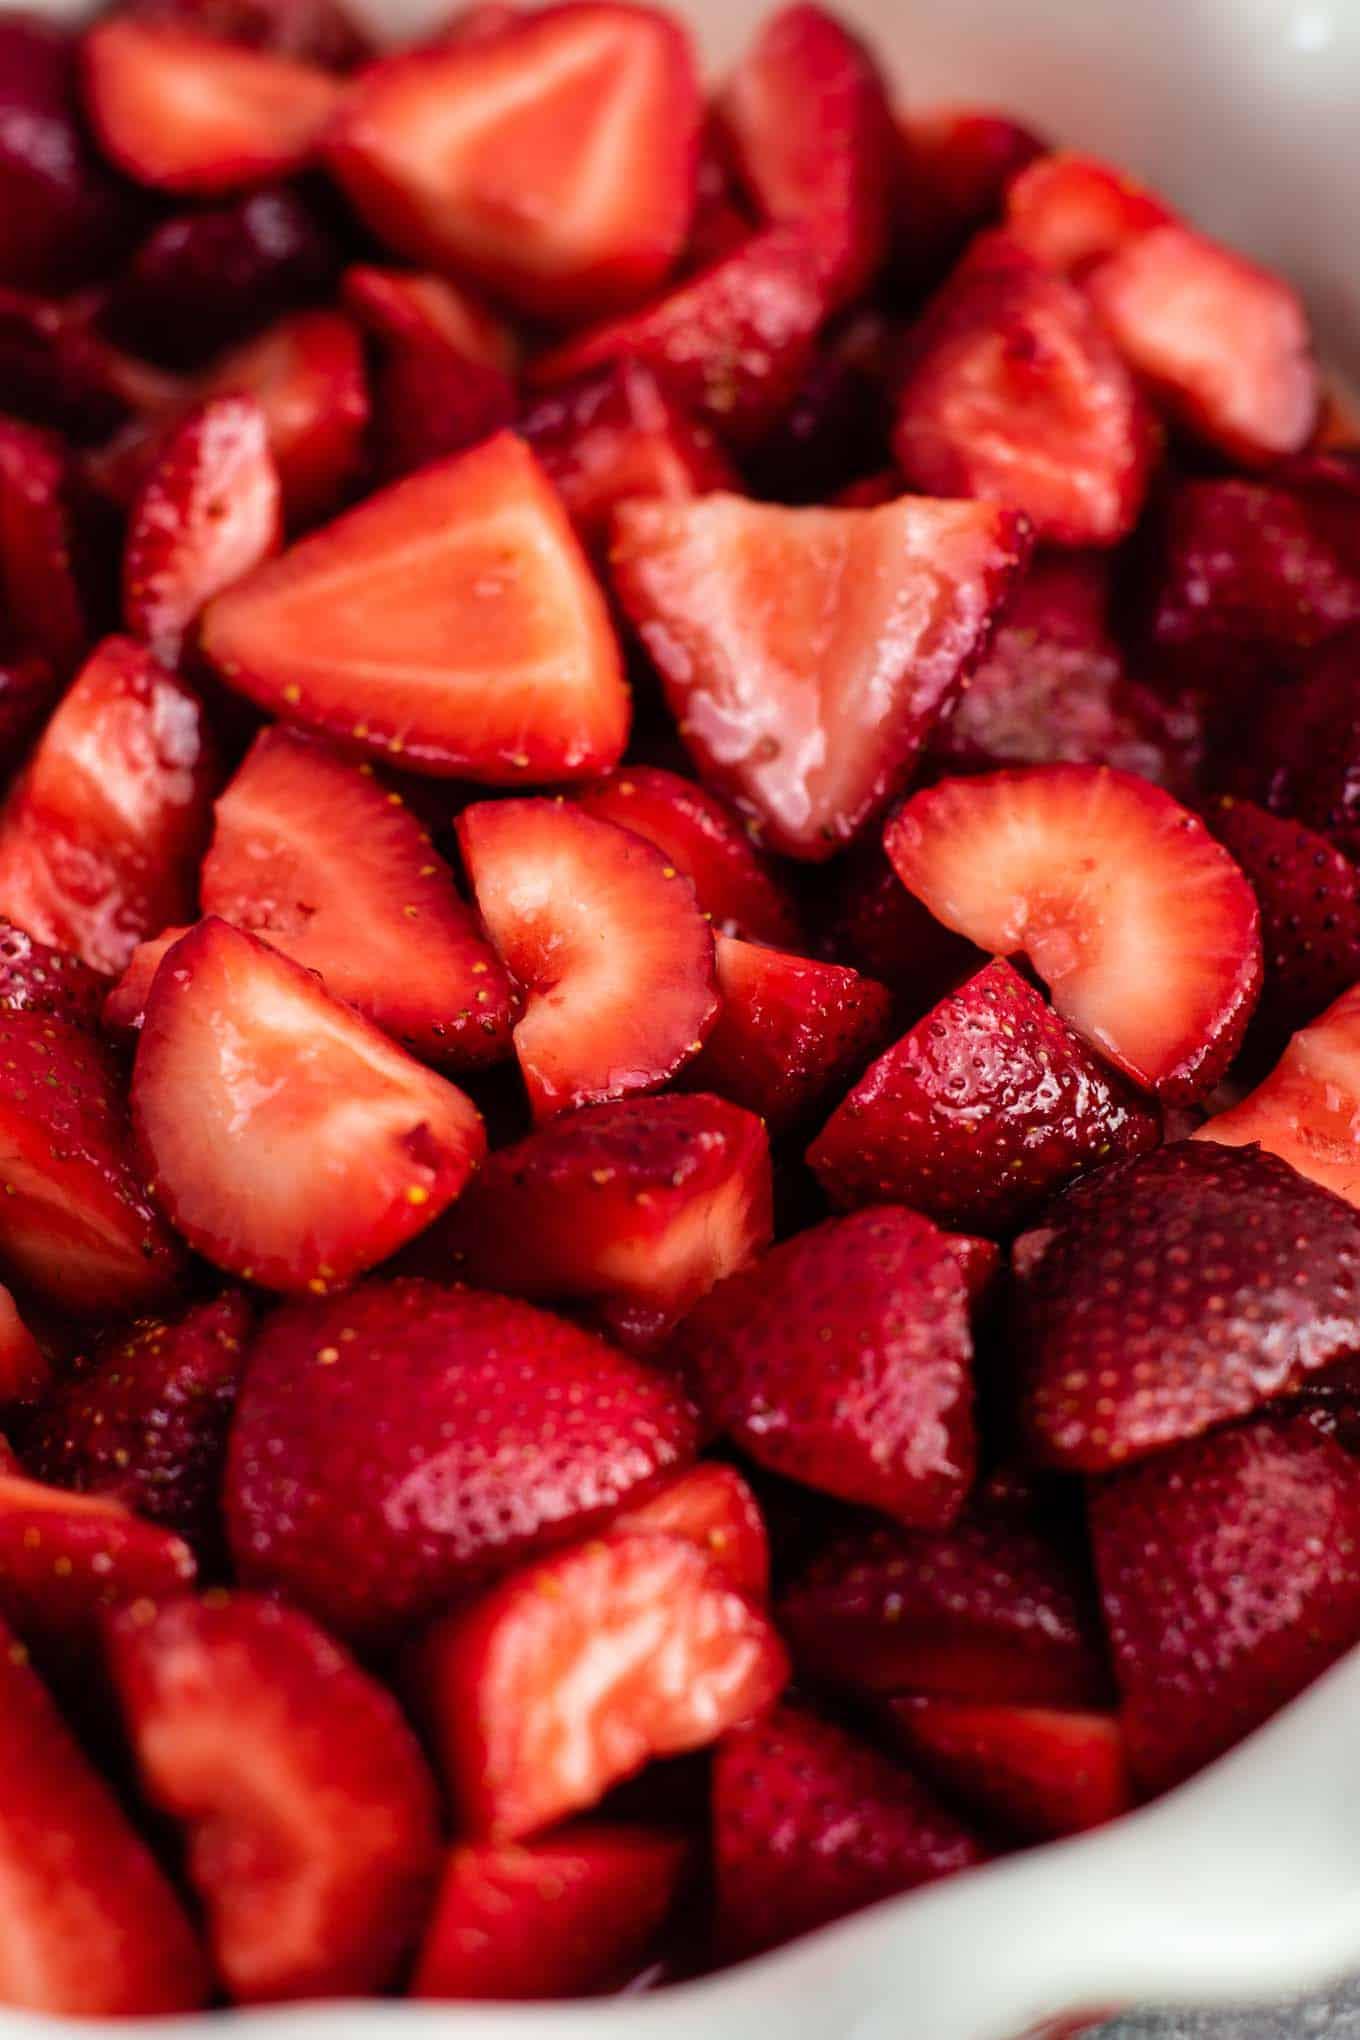 Easy strawberry crisp recipe (gluten free + vegan) – perfect for using up fresh strawberries! #strawberrycrisp #dessert #glutenfree #vegan #healthydessert #dairyfree